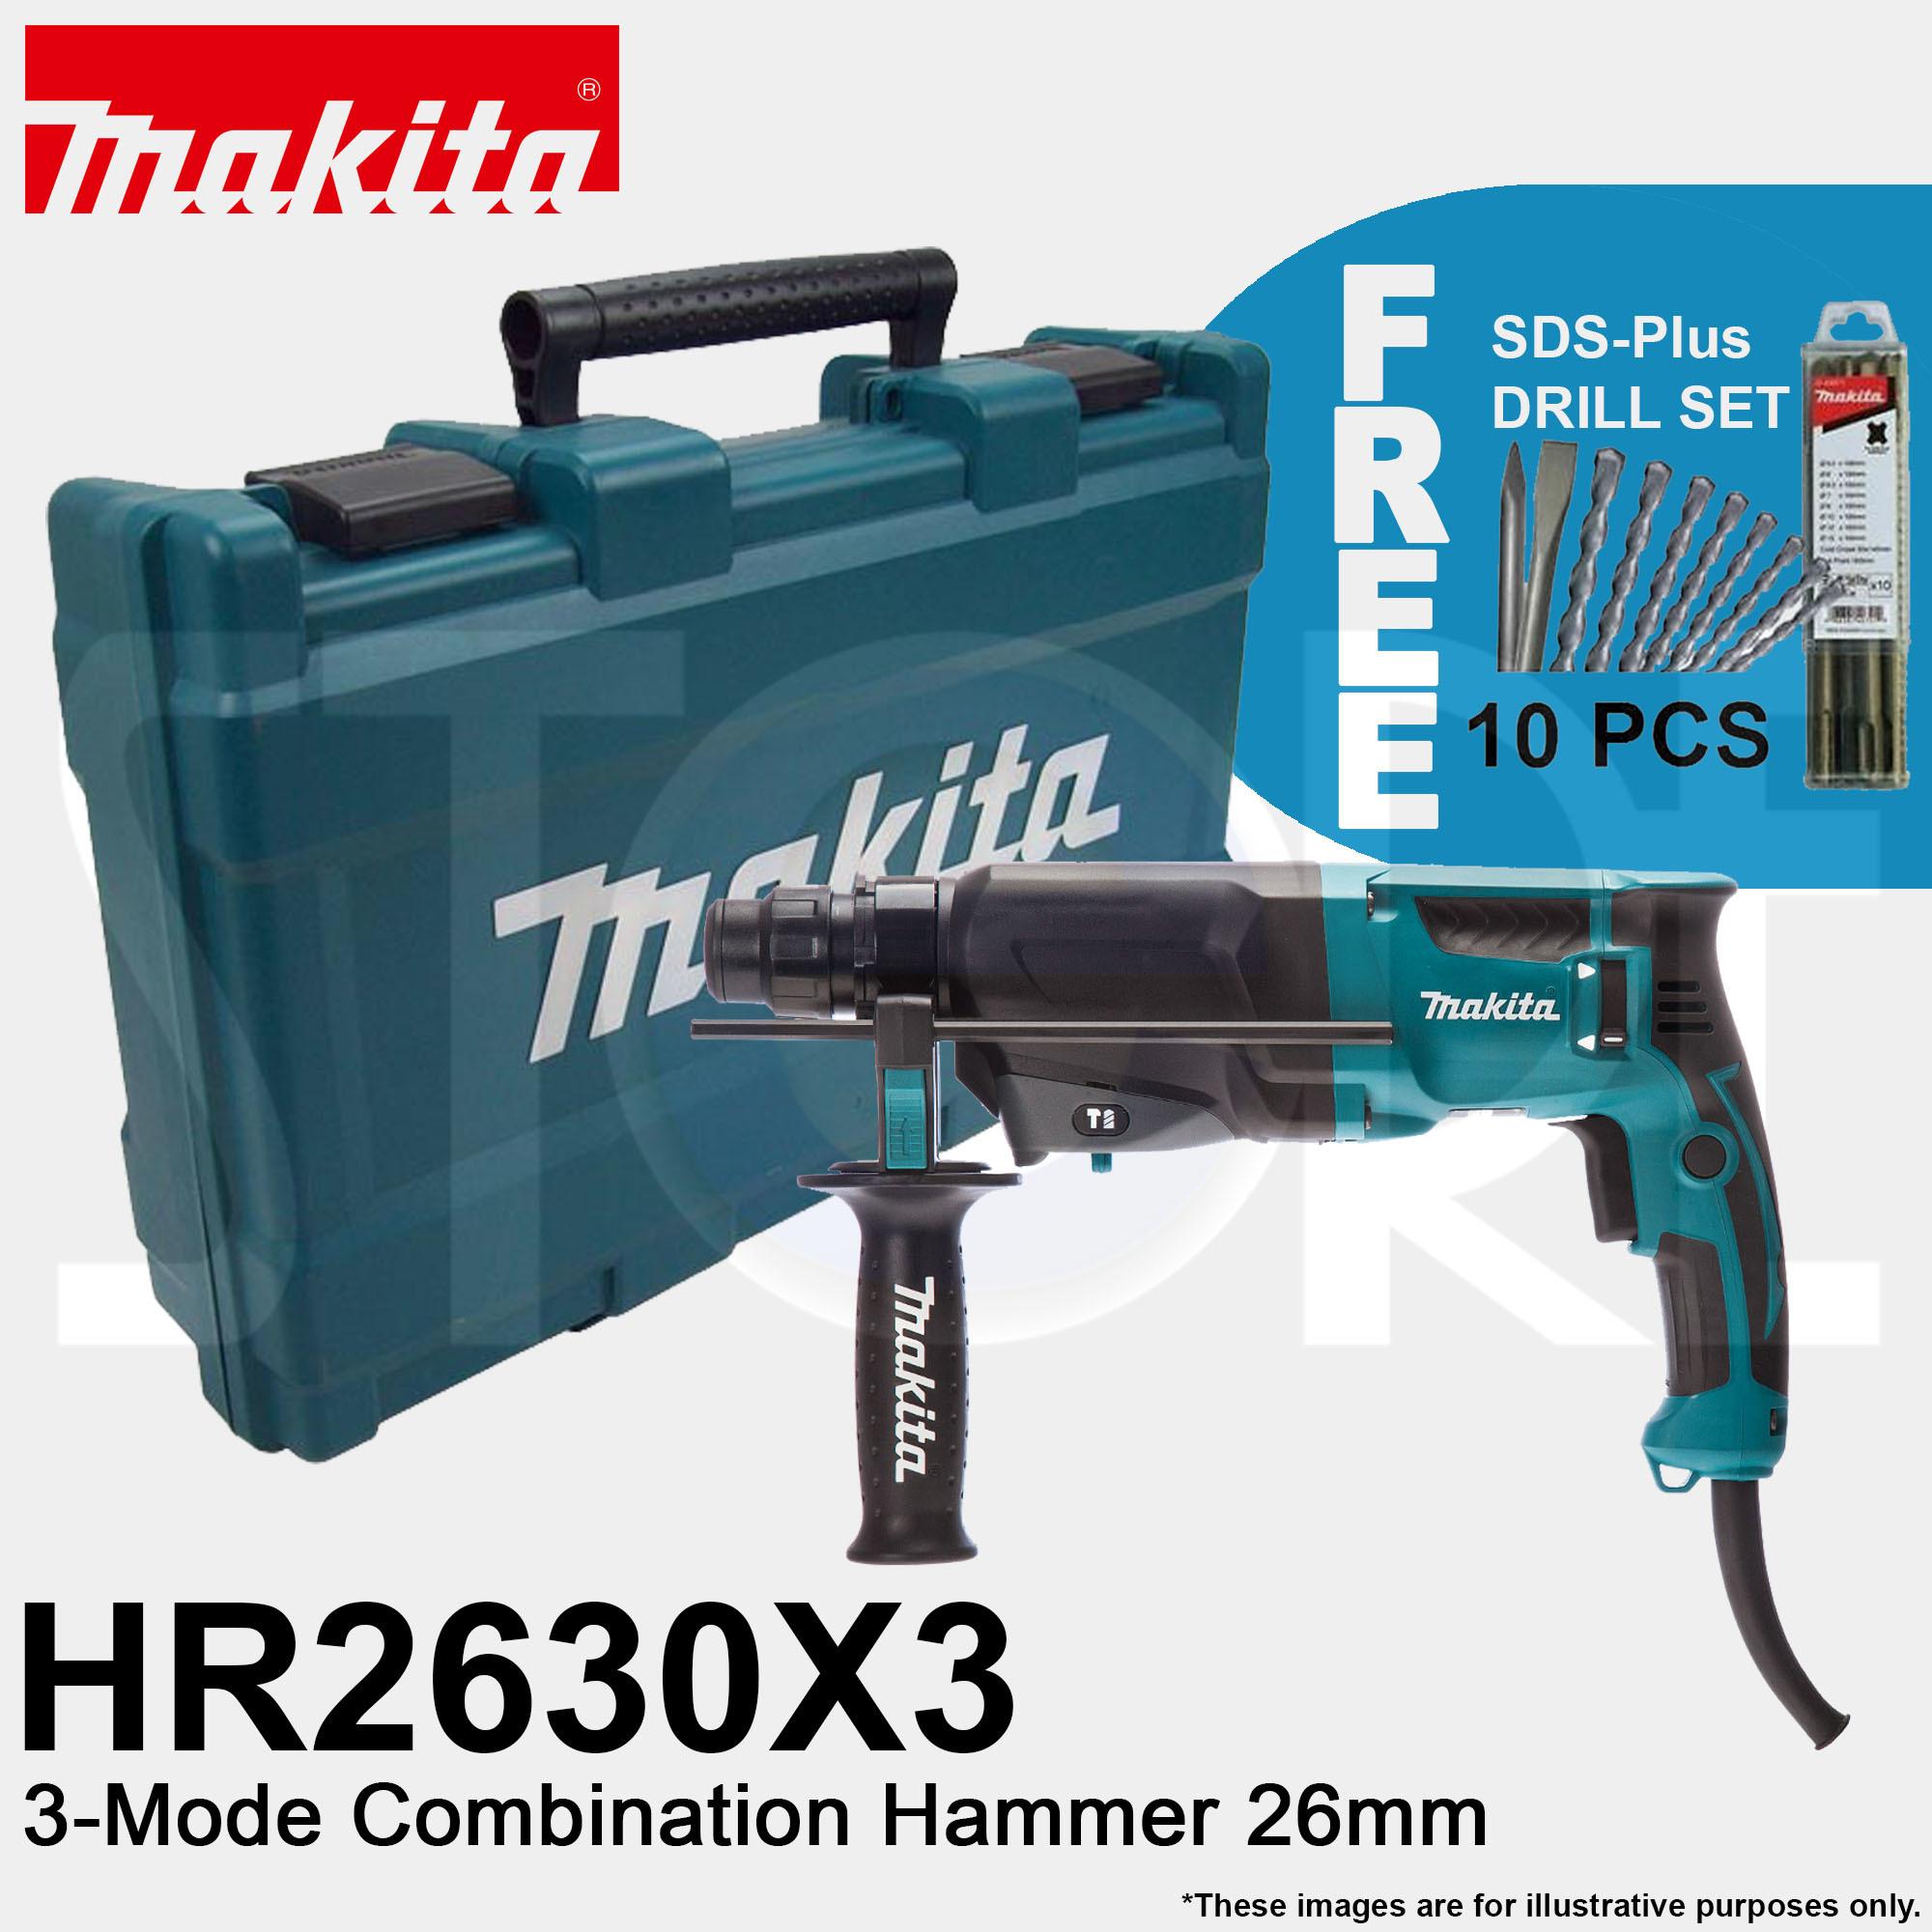 makitaMakita HR2630X3 3-Mode Combination Hammer Drill 26mm